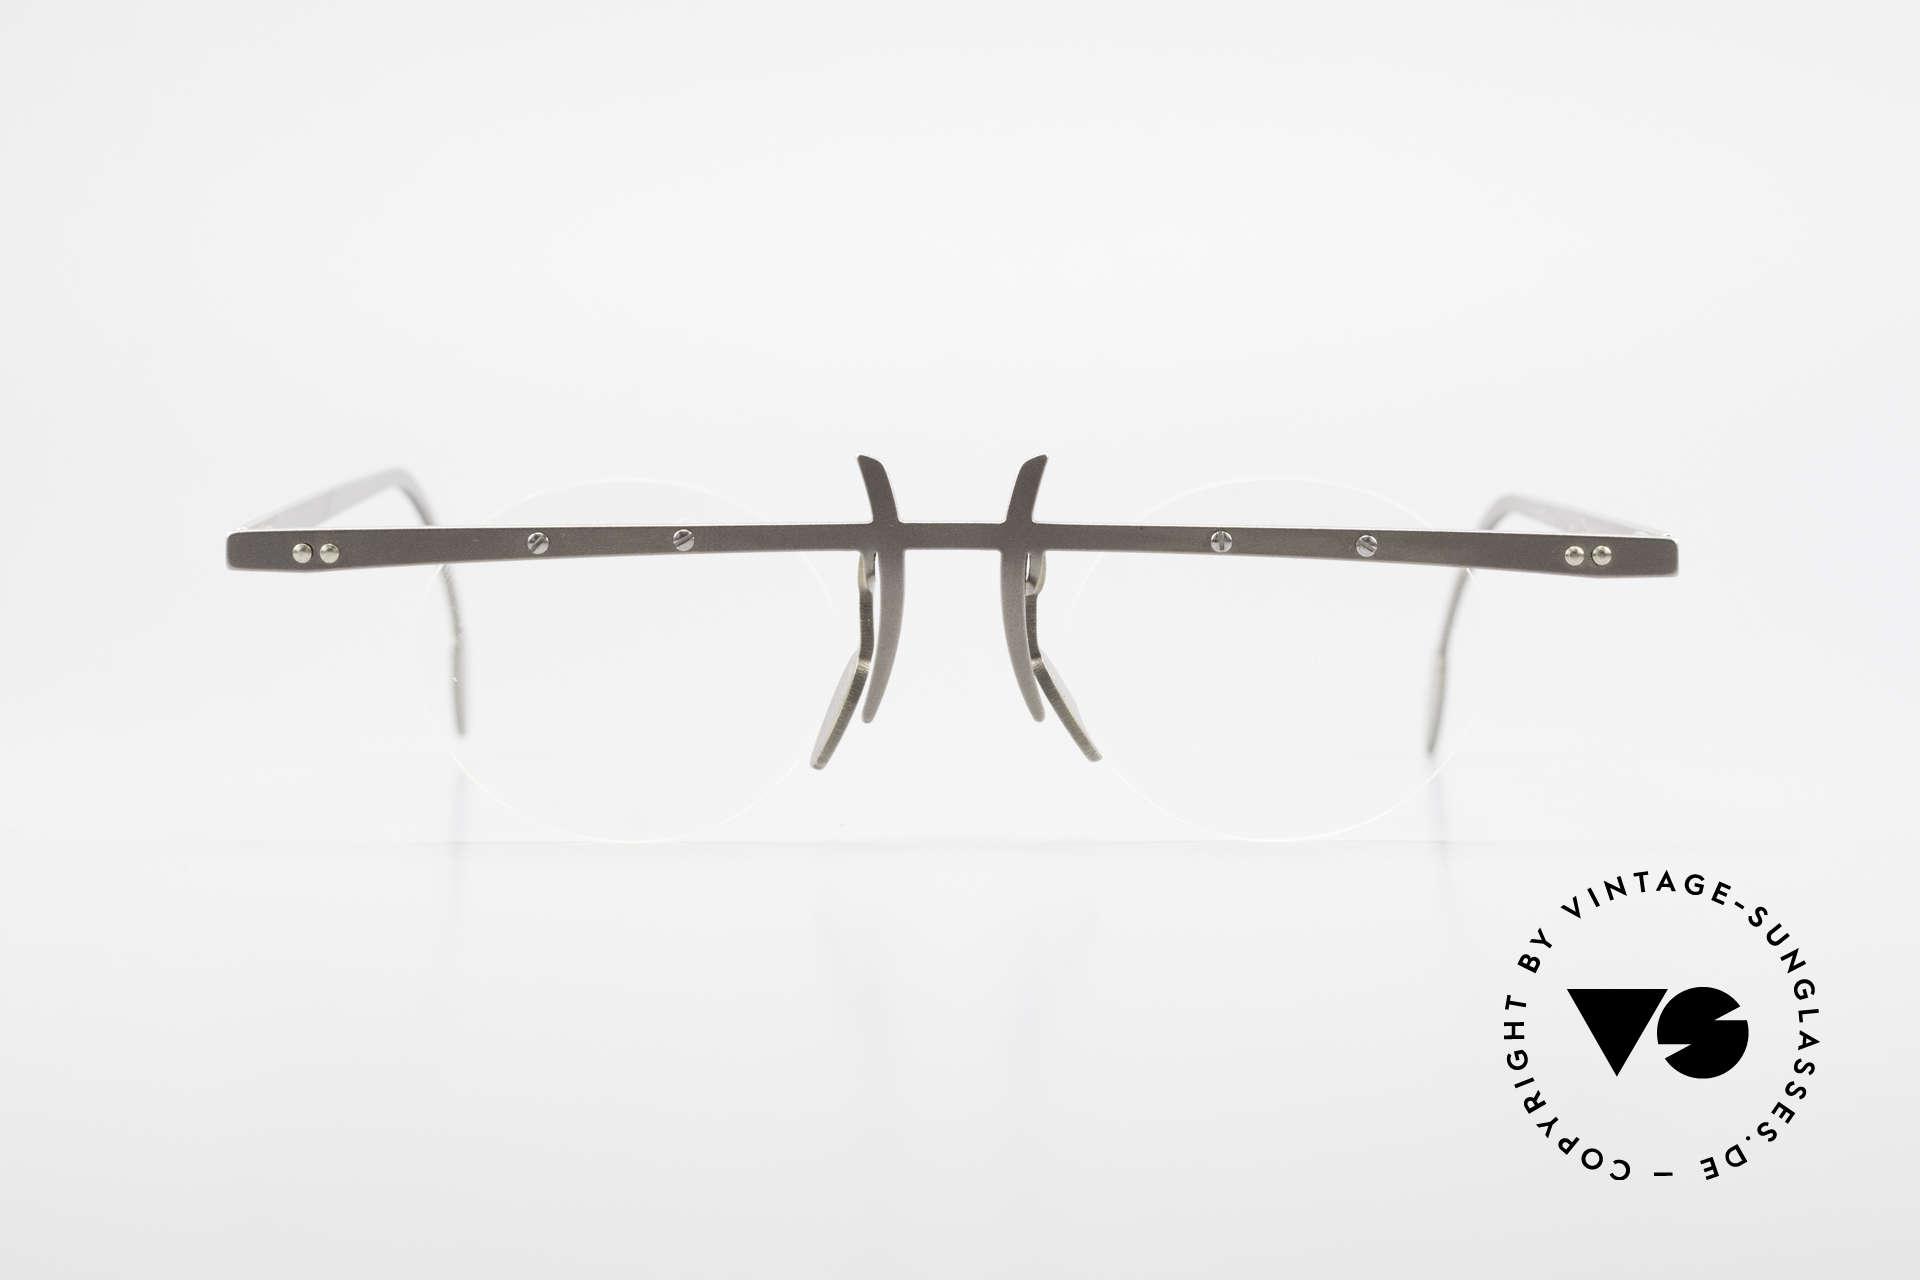 Theo Belgium Tita VI 3 Crazy Eyeglasses Titanium 90s, founded in 1989 as 'anti mainstream' eyewear / glasses, Made for Men and Women